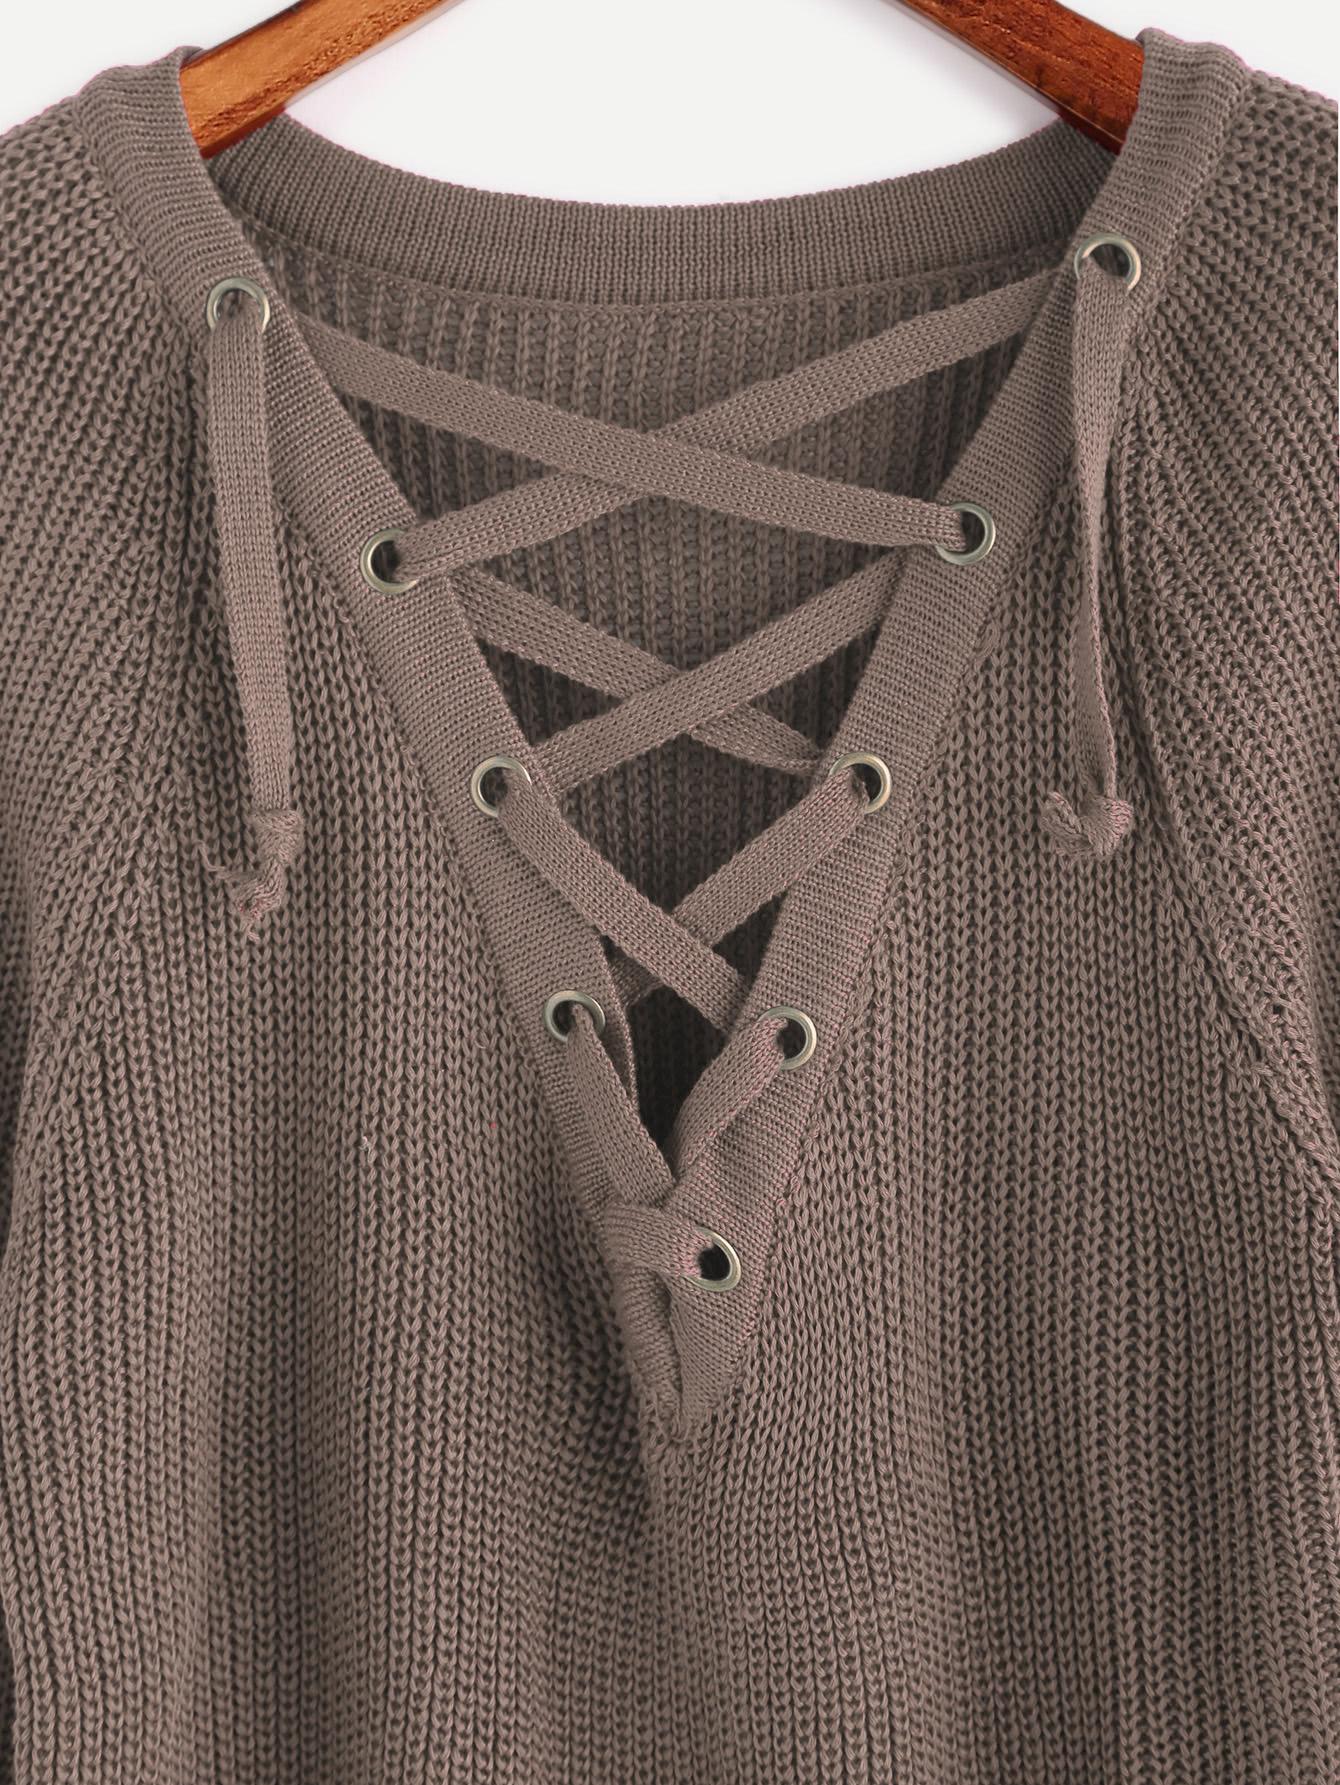 Khaki Eyelet Lace Up Slit Side High Low Sweater -SheIn(Sheinside) 19b61a113